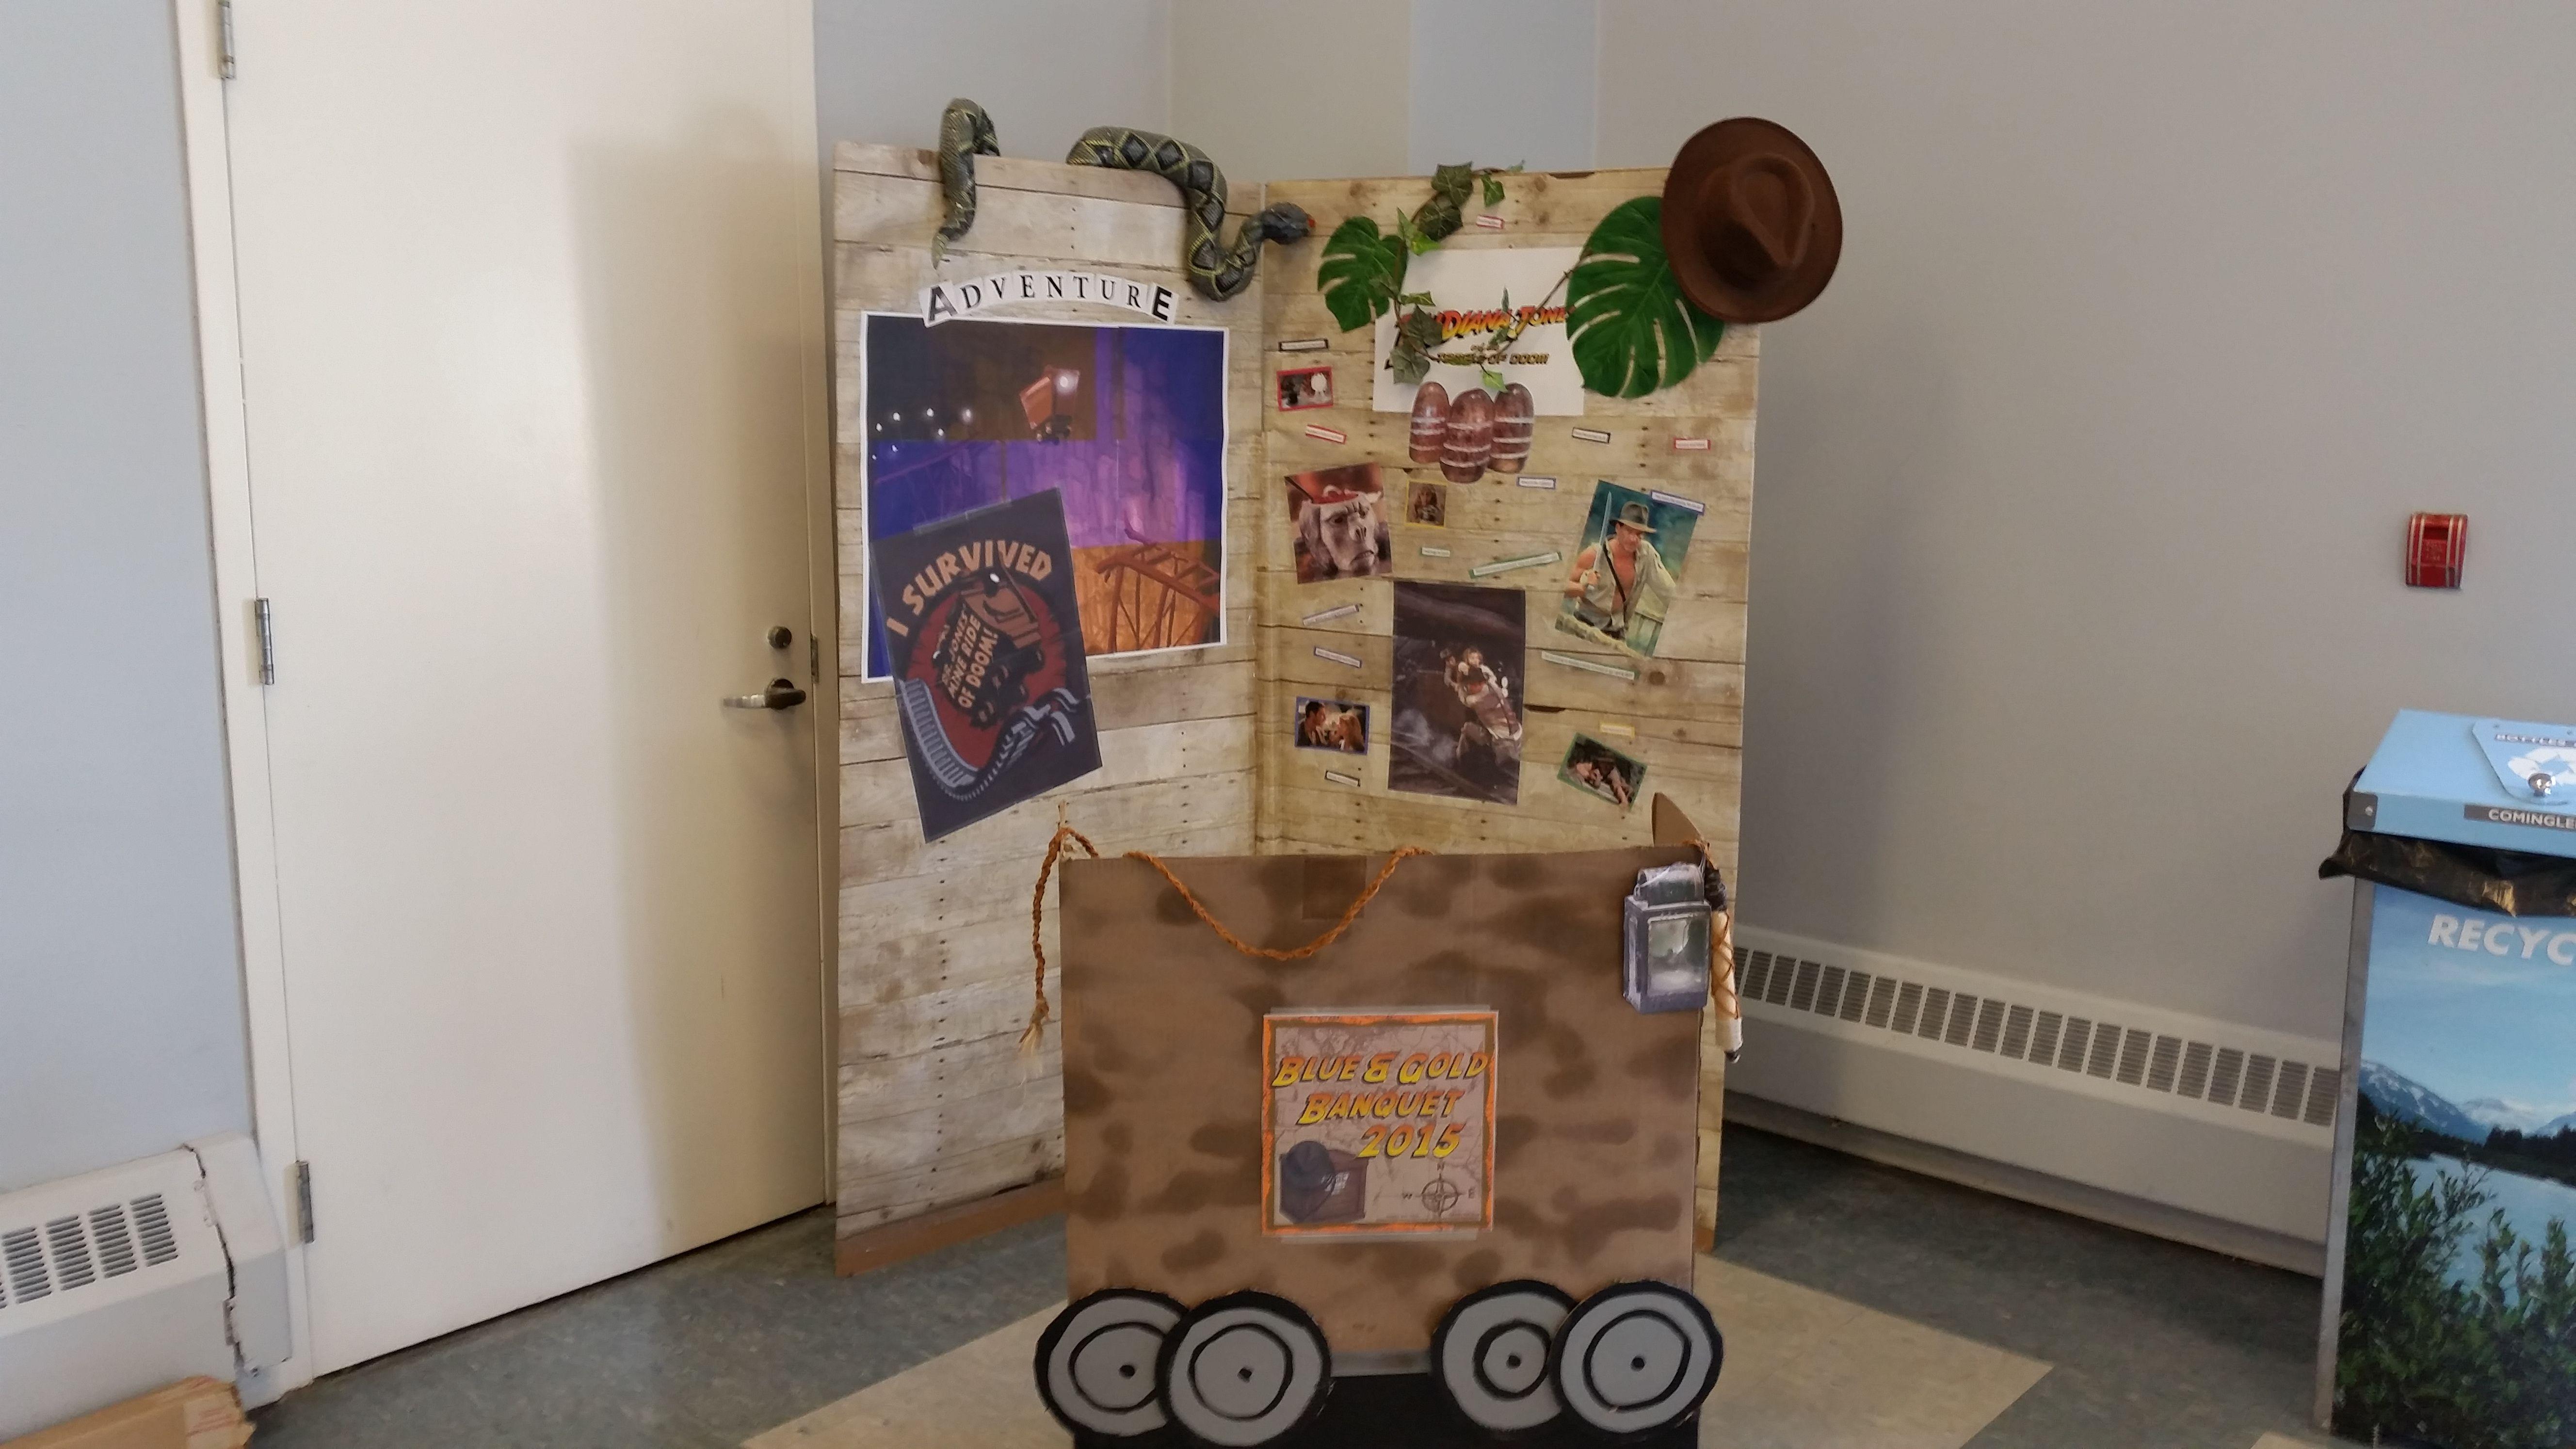 indianjones birthday party invitations printable%0A Indiana Jones Photo booth